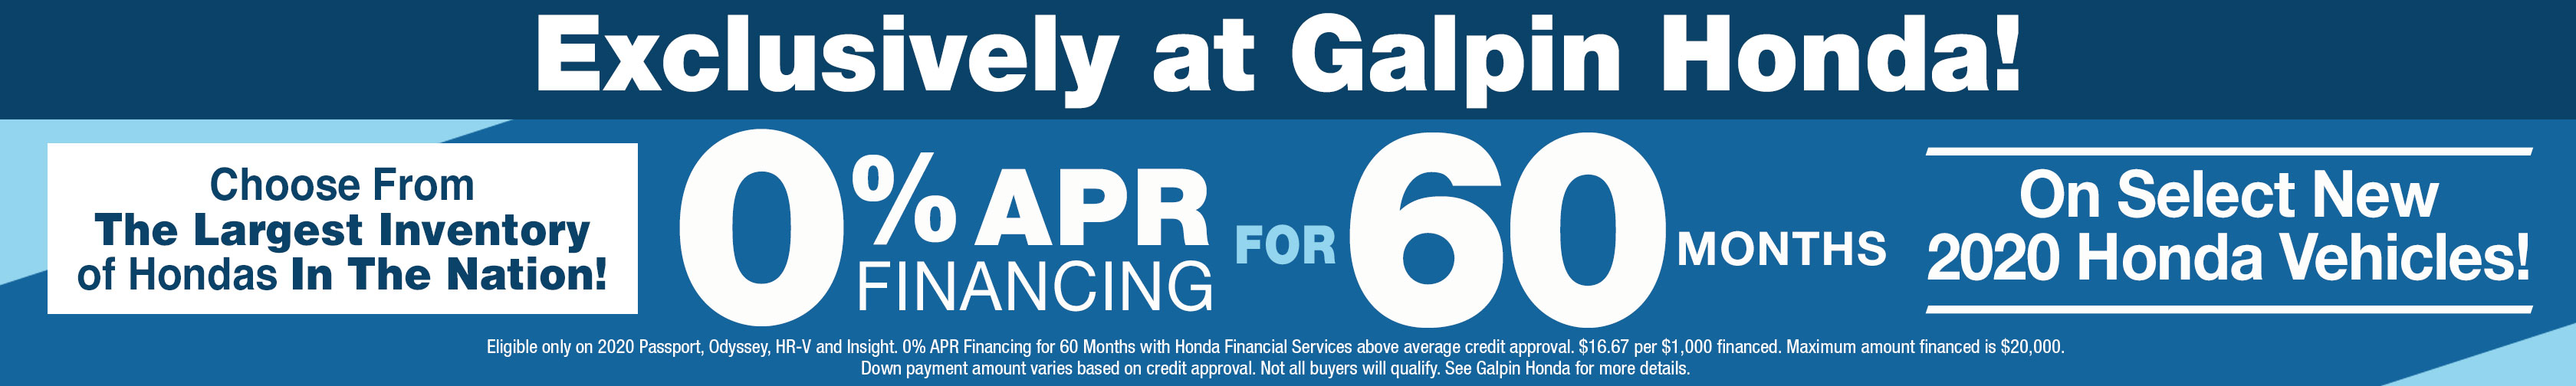 Galpin Honda Sales Event